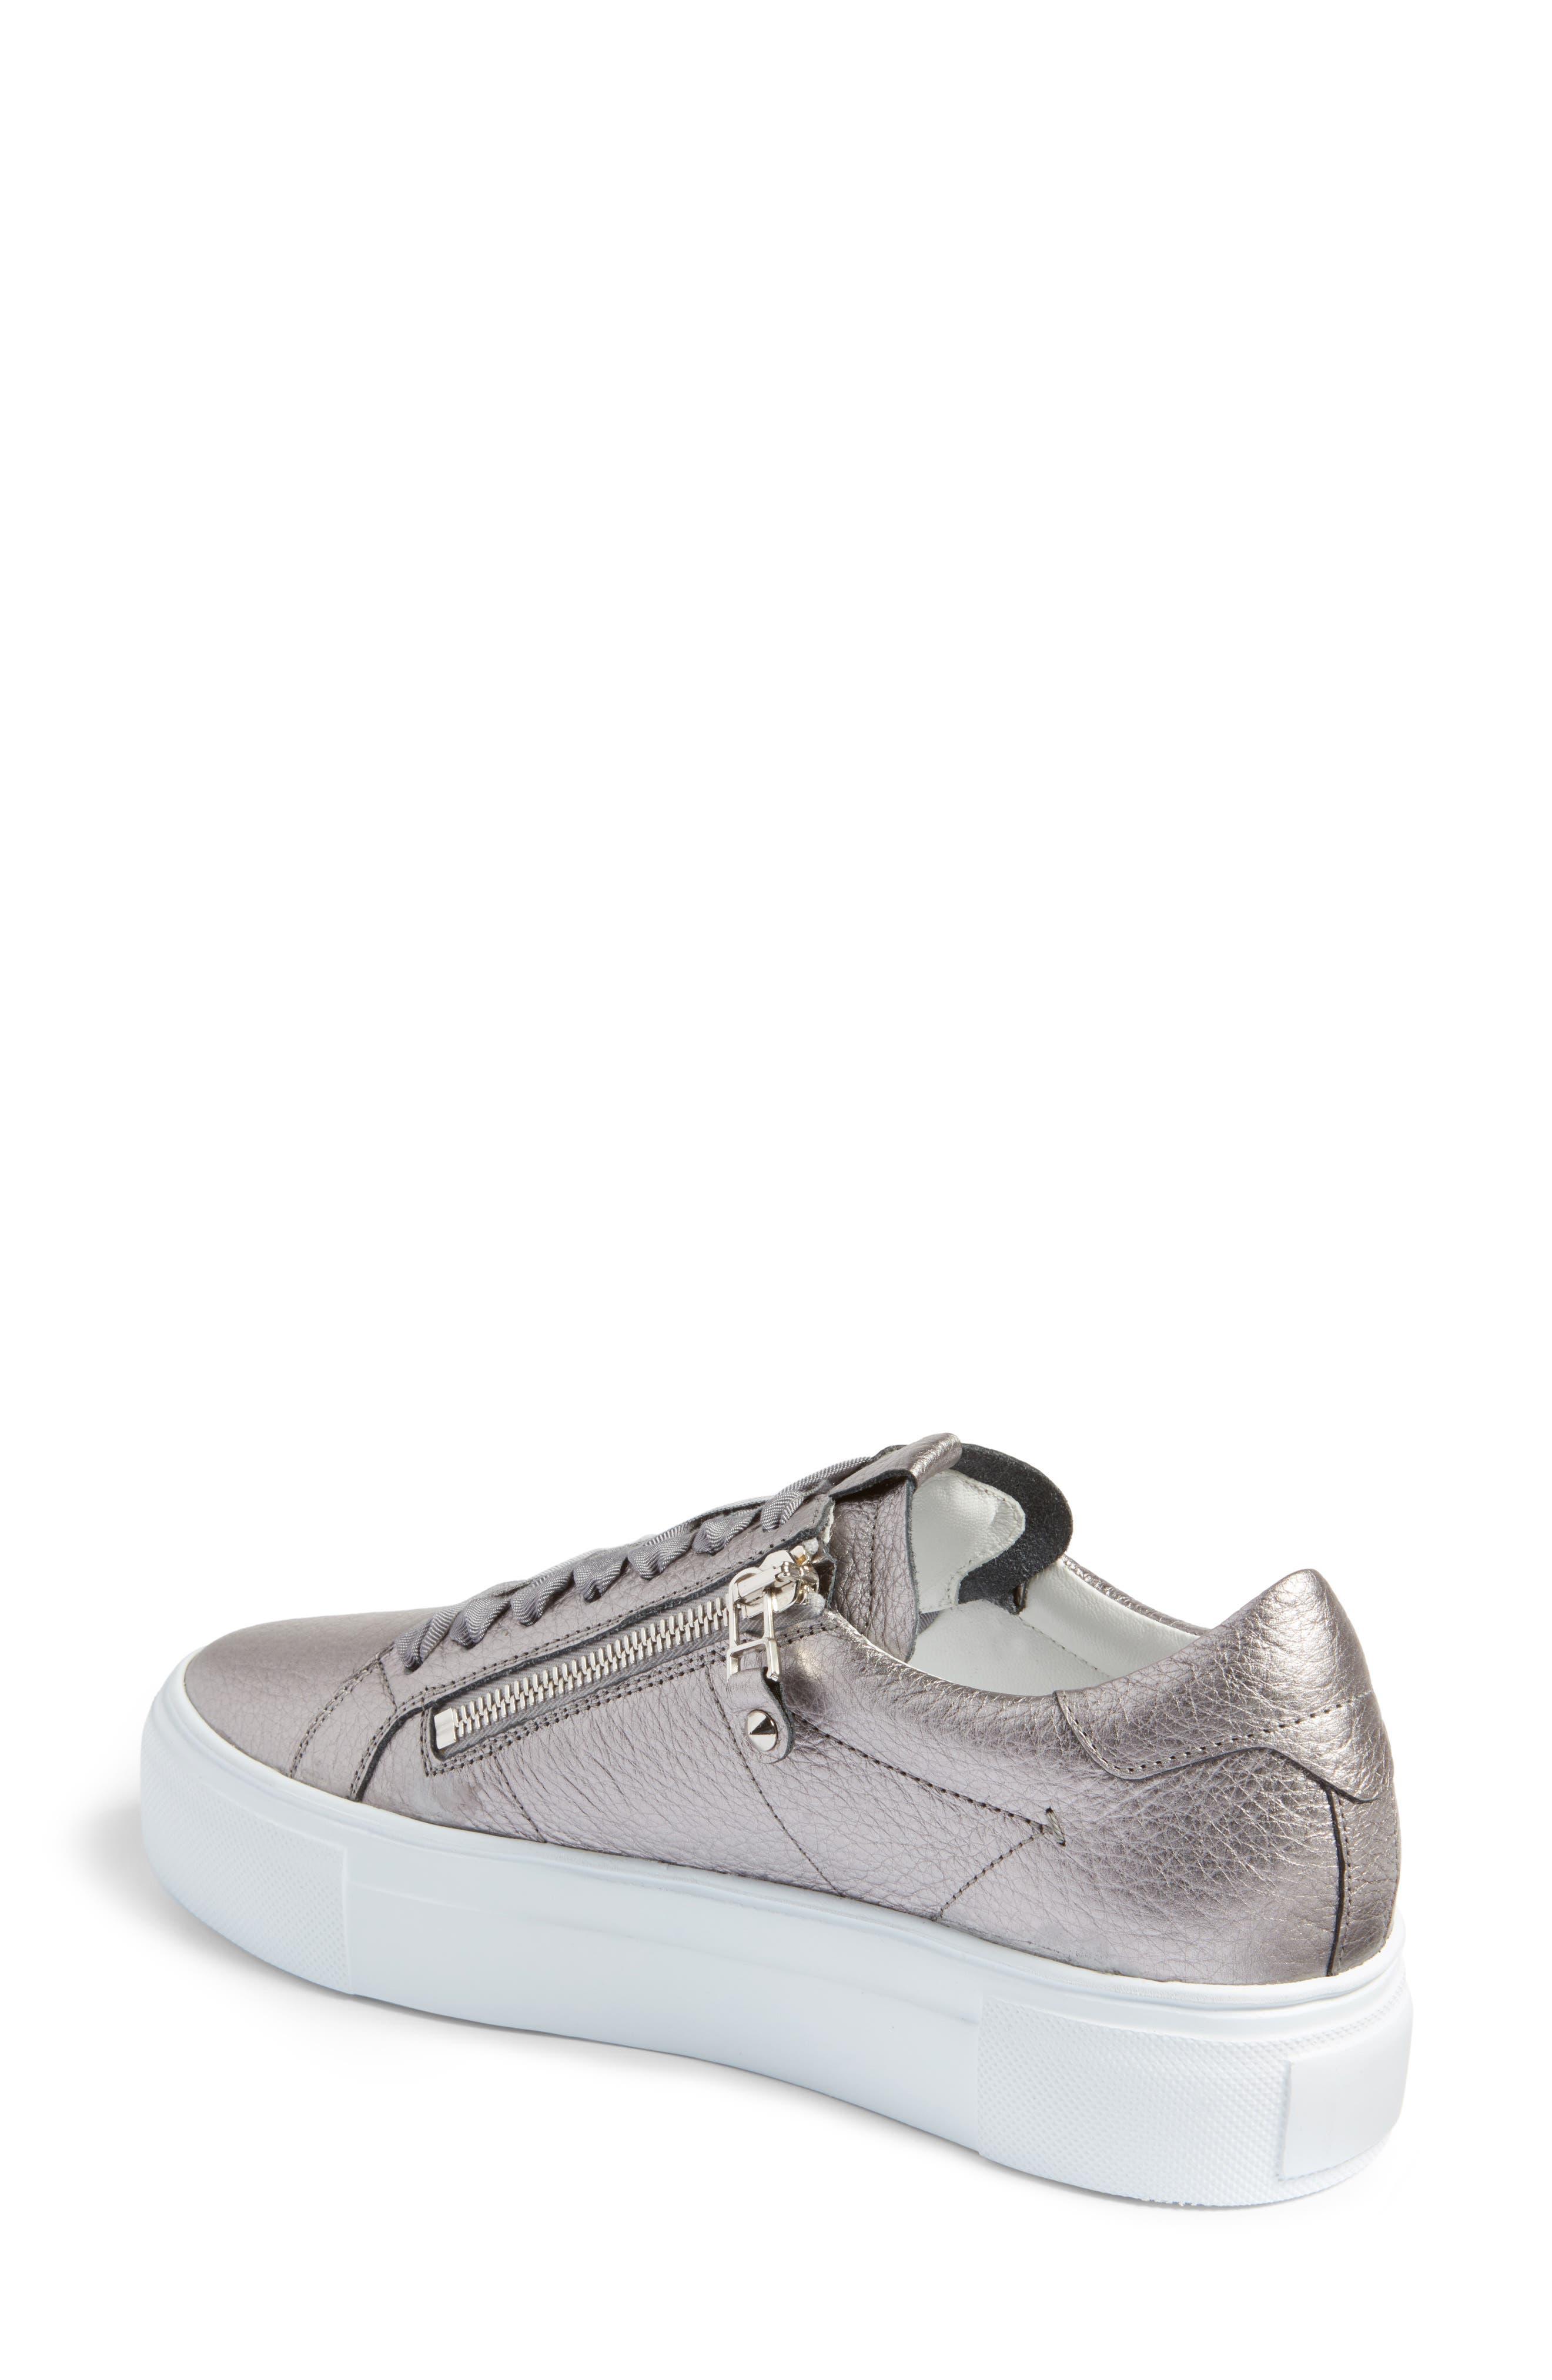 Kennel & Schmenger Big Low Top Platform Sneaker,                             Alternate thumbnail 2, color,                             020